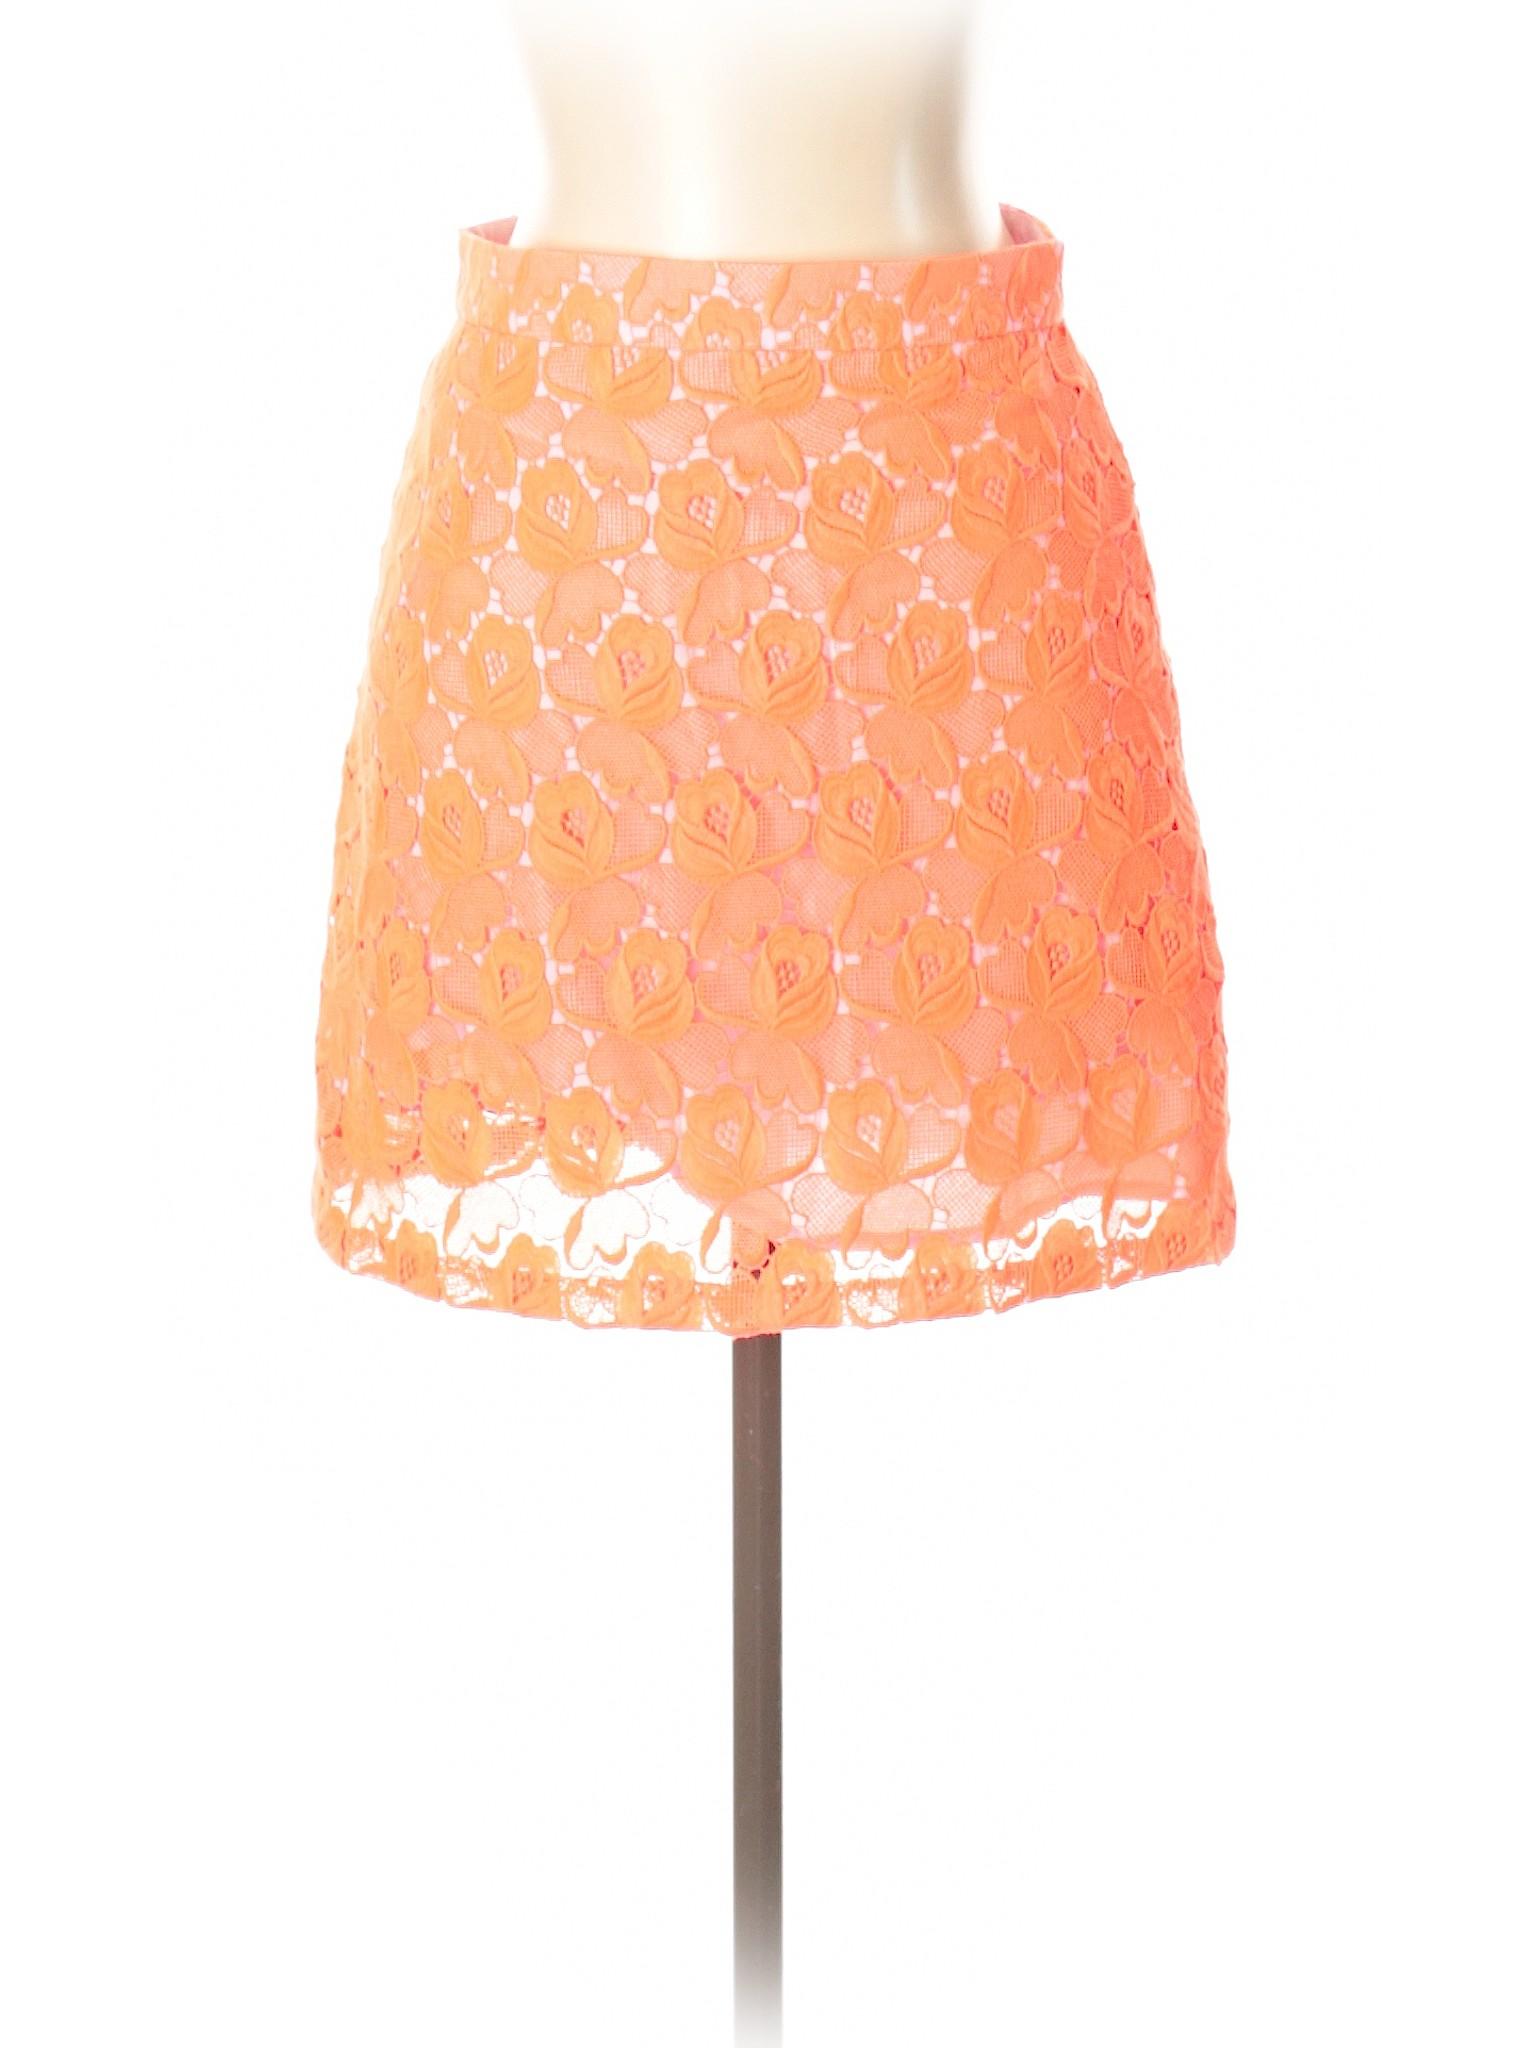 Boutique Casual Boutique Skirt Boutique Casual Boutique Skirt Casual Casual Boutique Casual Boutique Skirt Casual Skirt Skirt wtxP5YYqgp